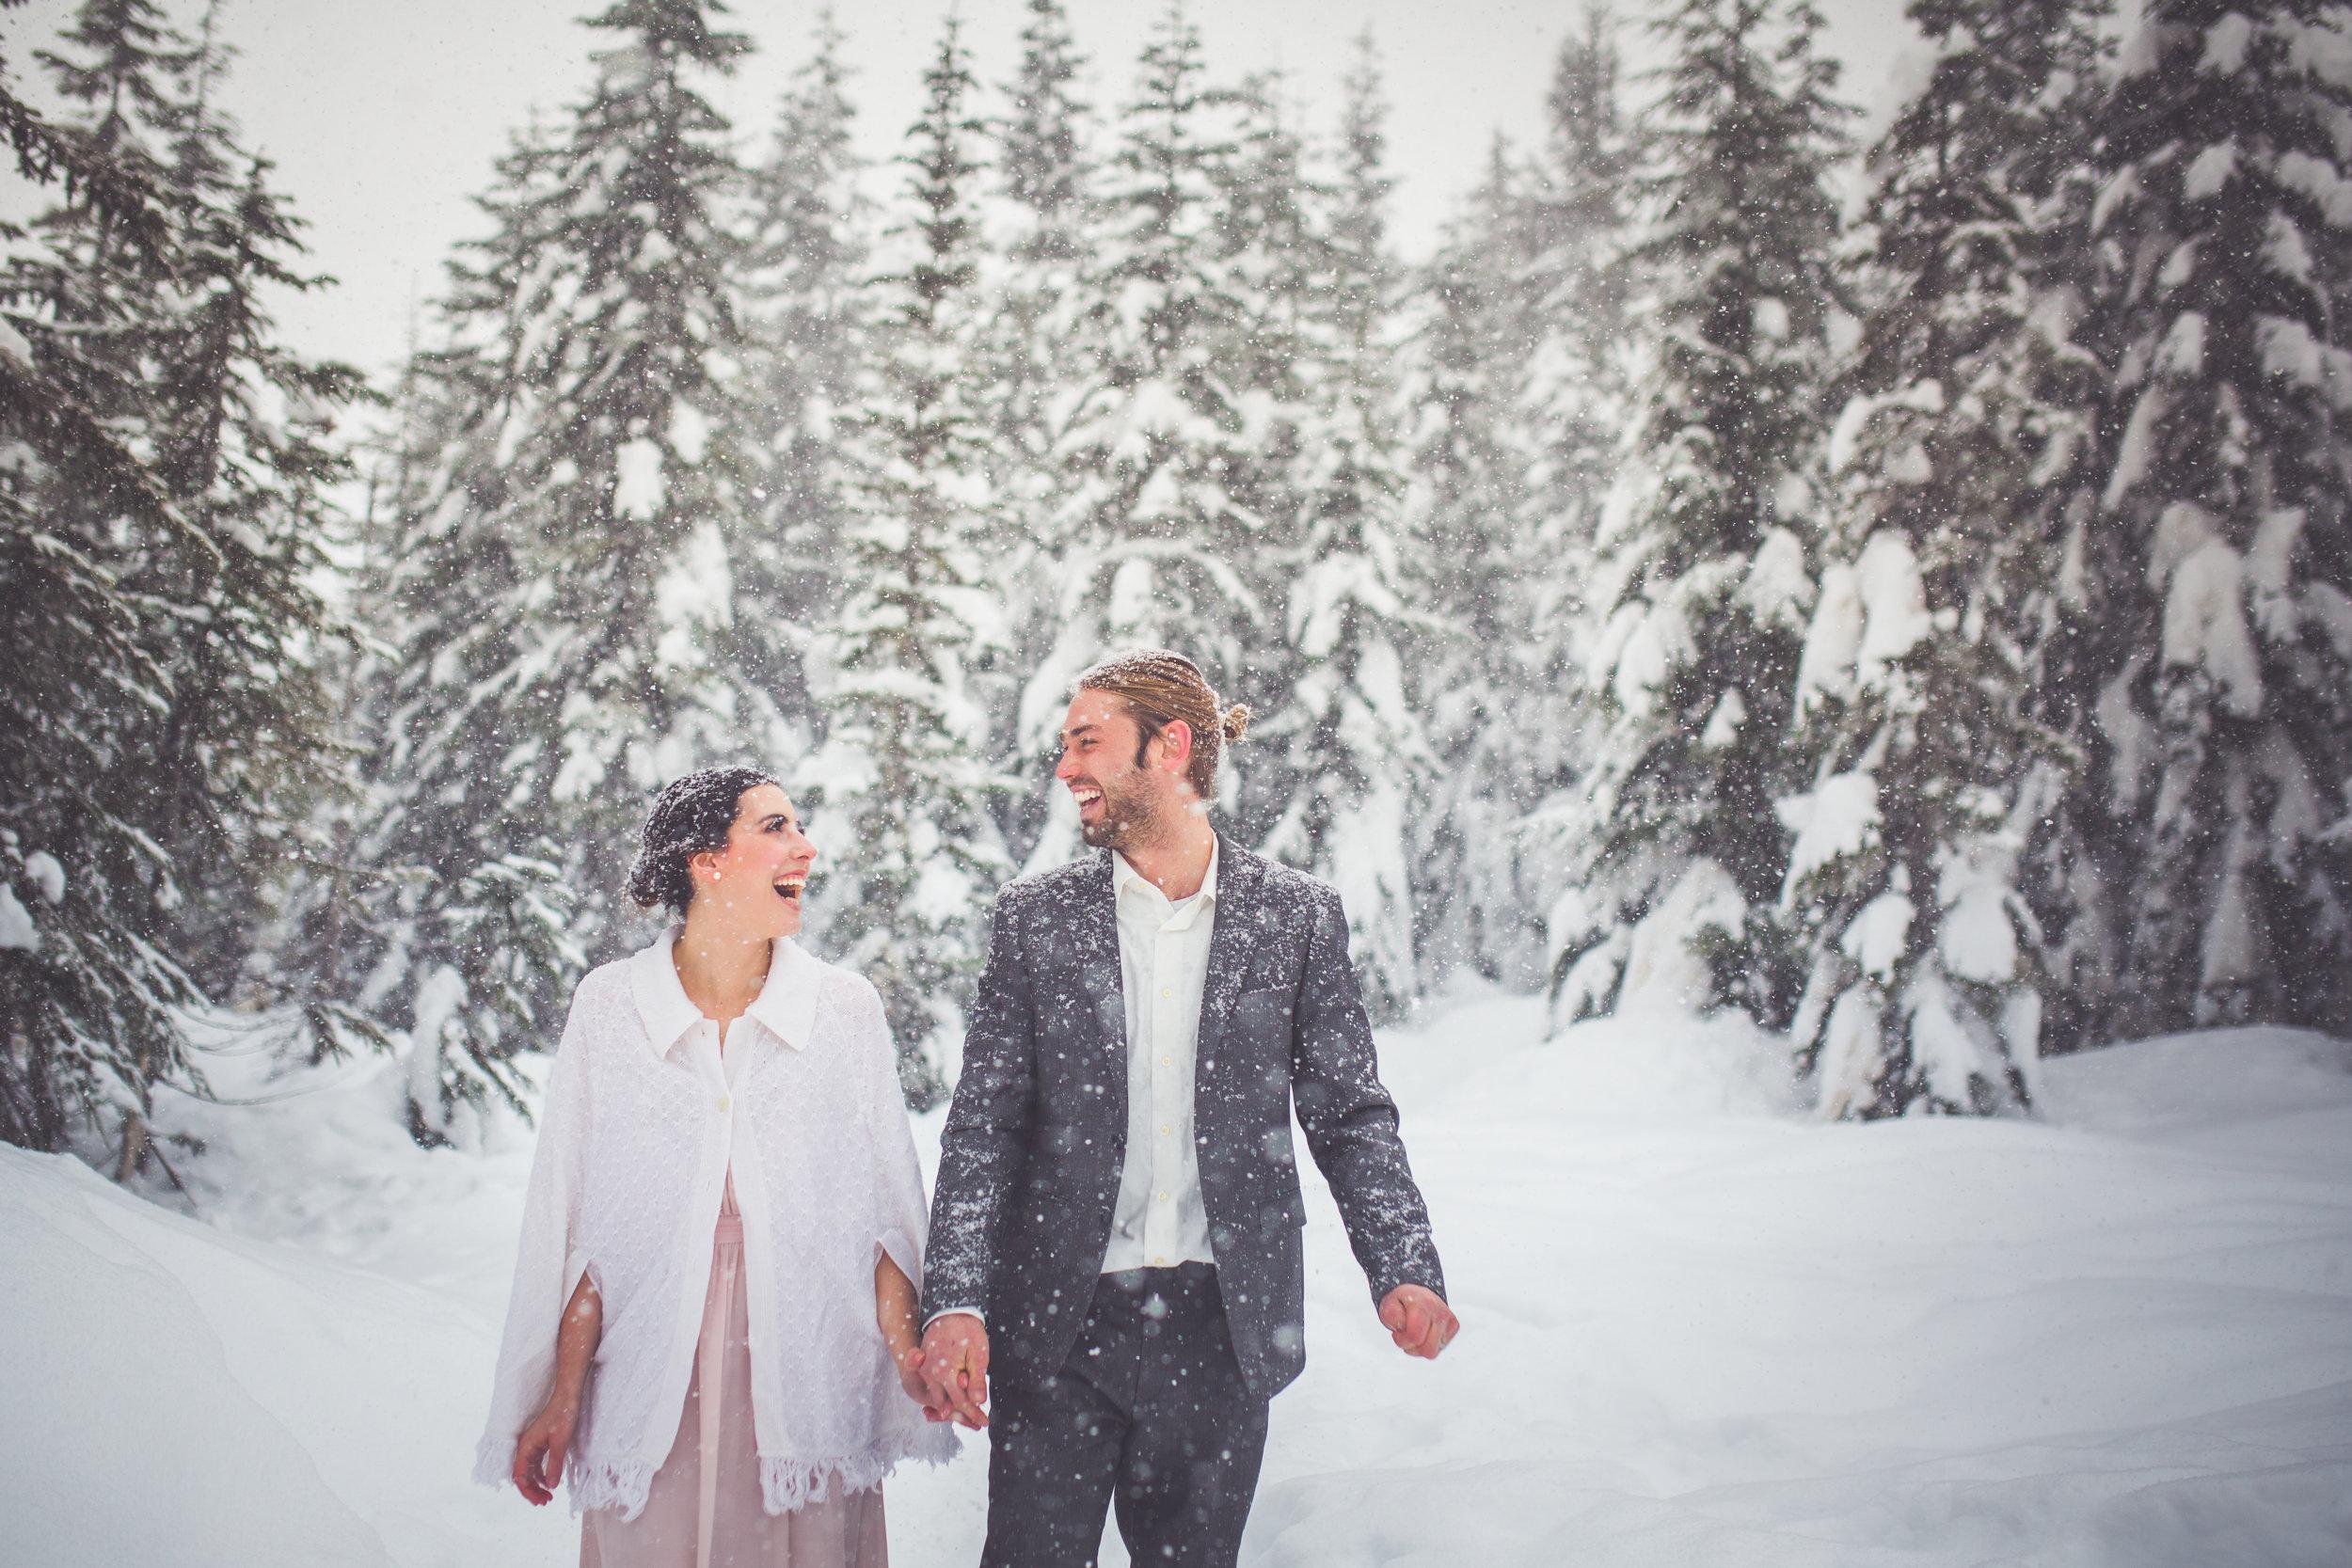 bride and groom laughing at snowy winter wedding at mount washington resort